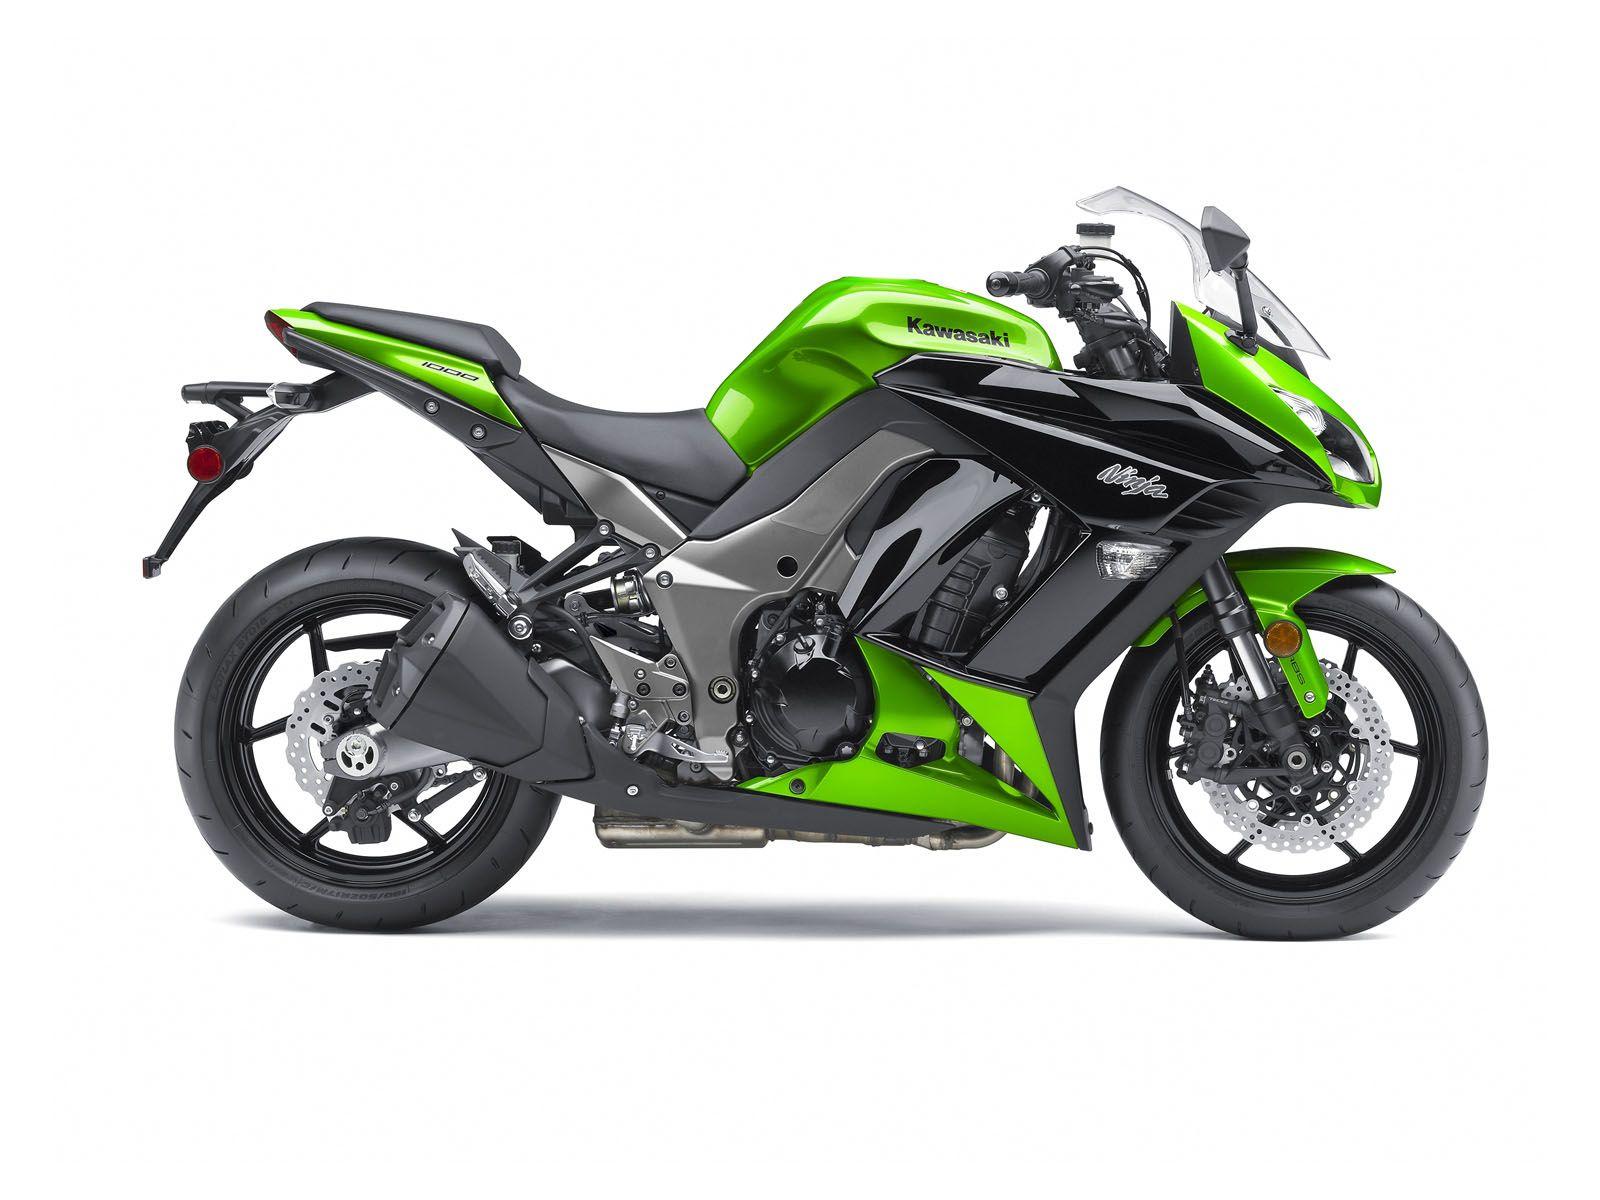 2012 kawasaki ninja 1000 abs | big bike and cars | pinterest